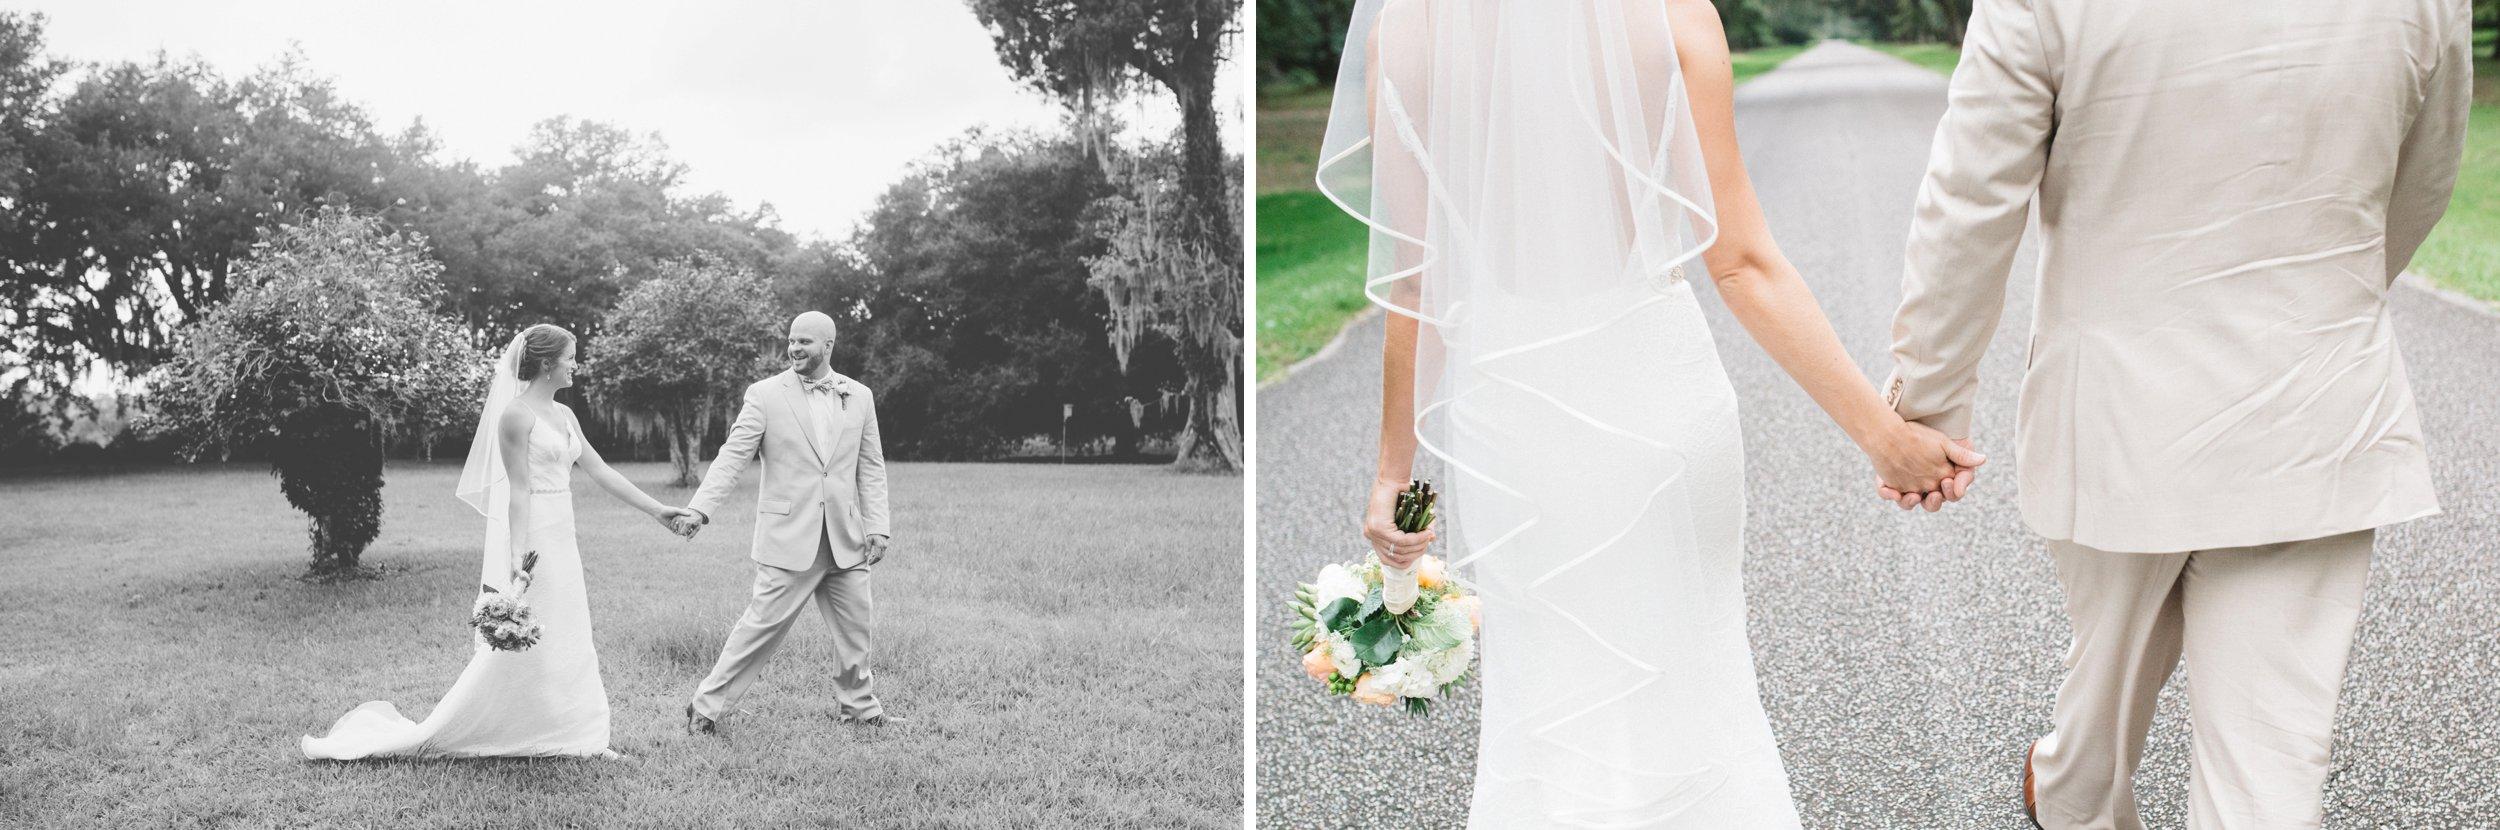 mepkin-abbey-wedding-34.jpg